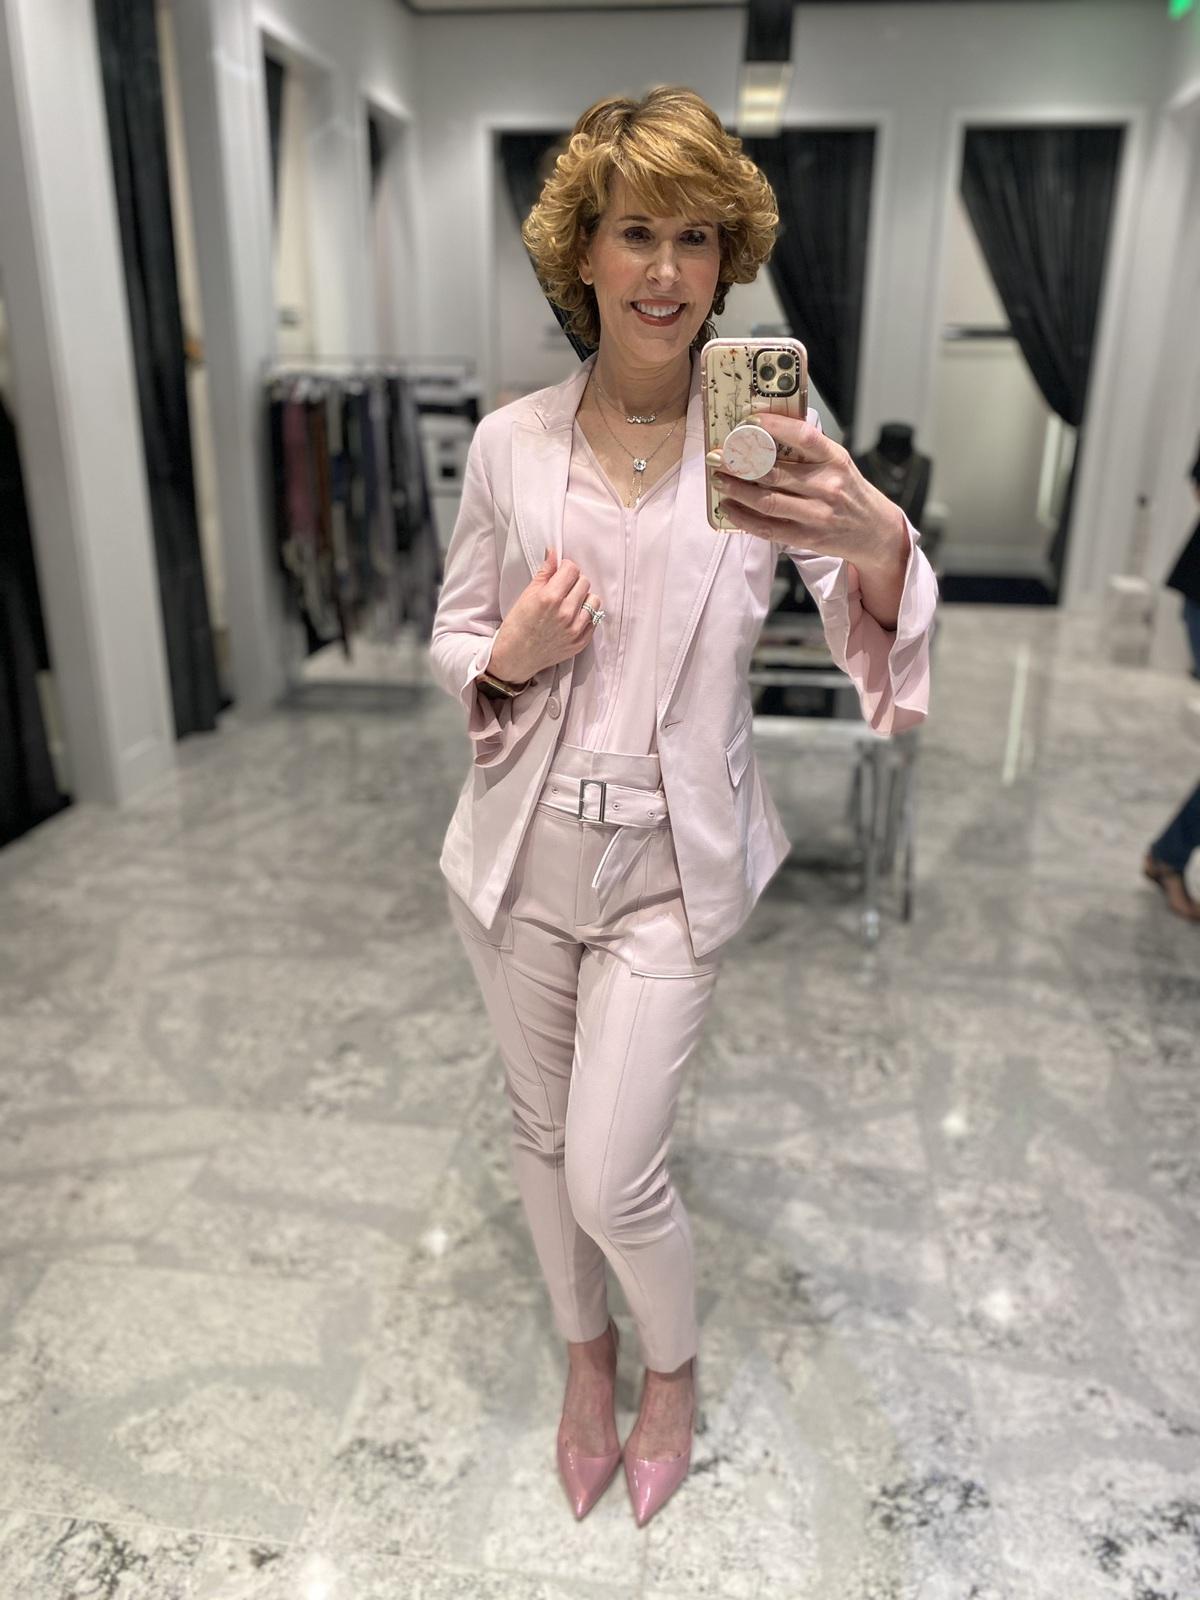 Mirror selfie of woman over 50 wearing pink ankle pants pink v-neck top, pink jacket pink pumps doing spring wardrobe update